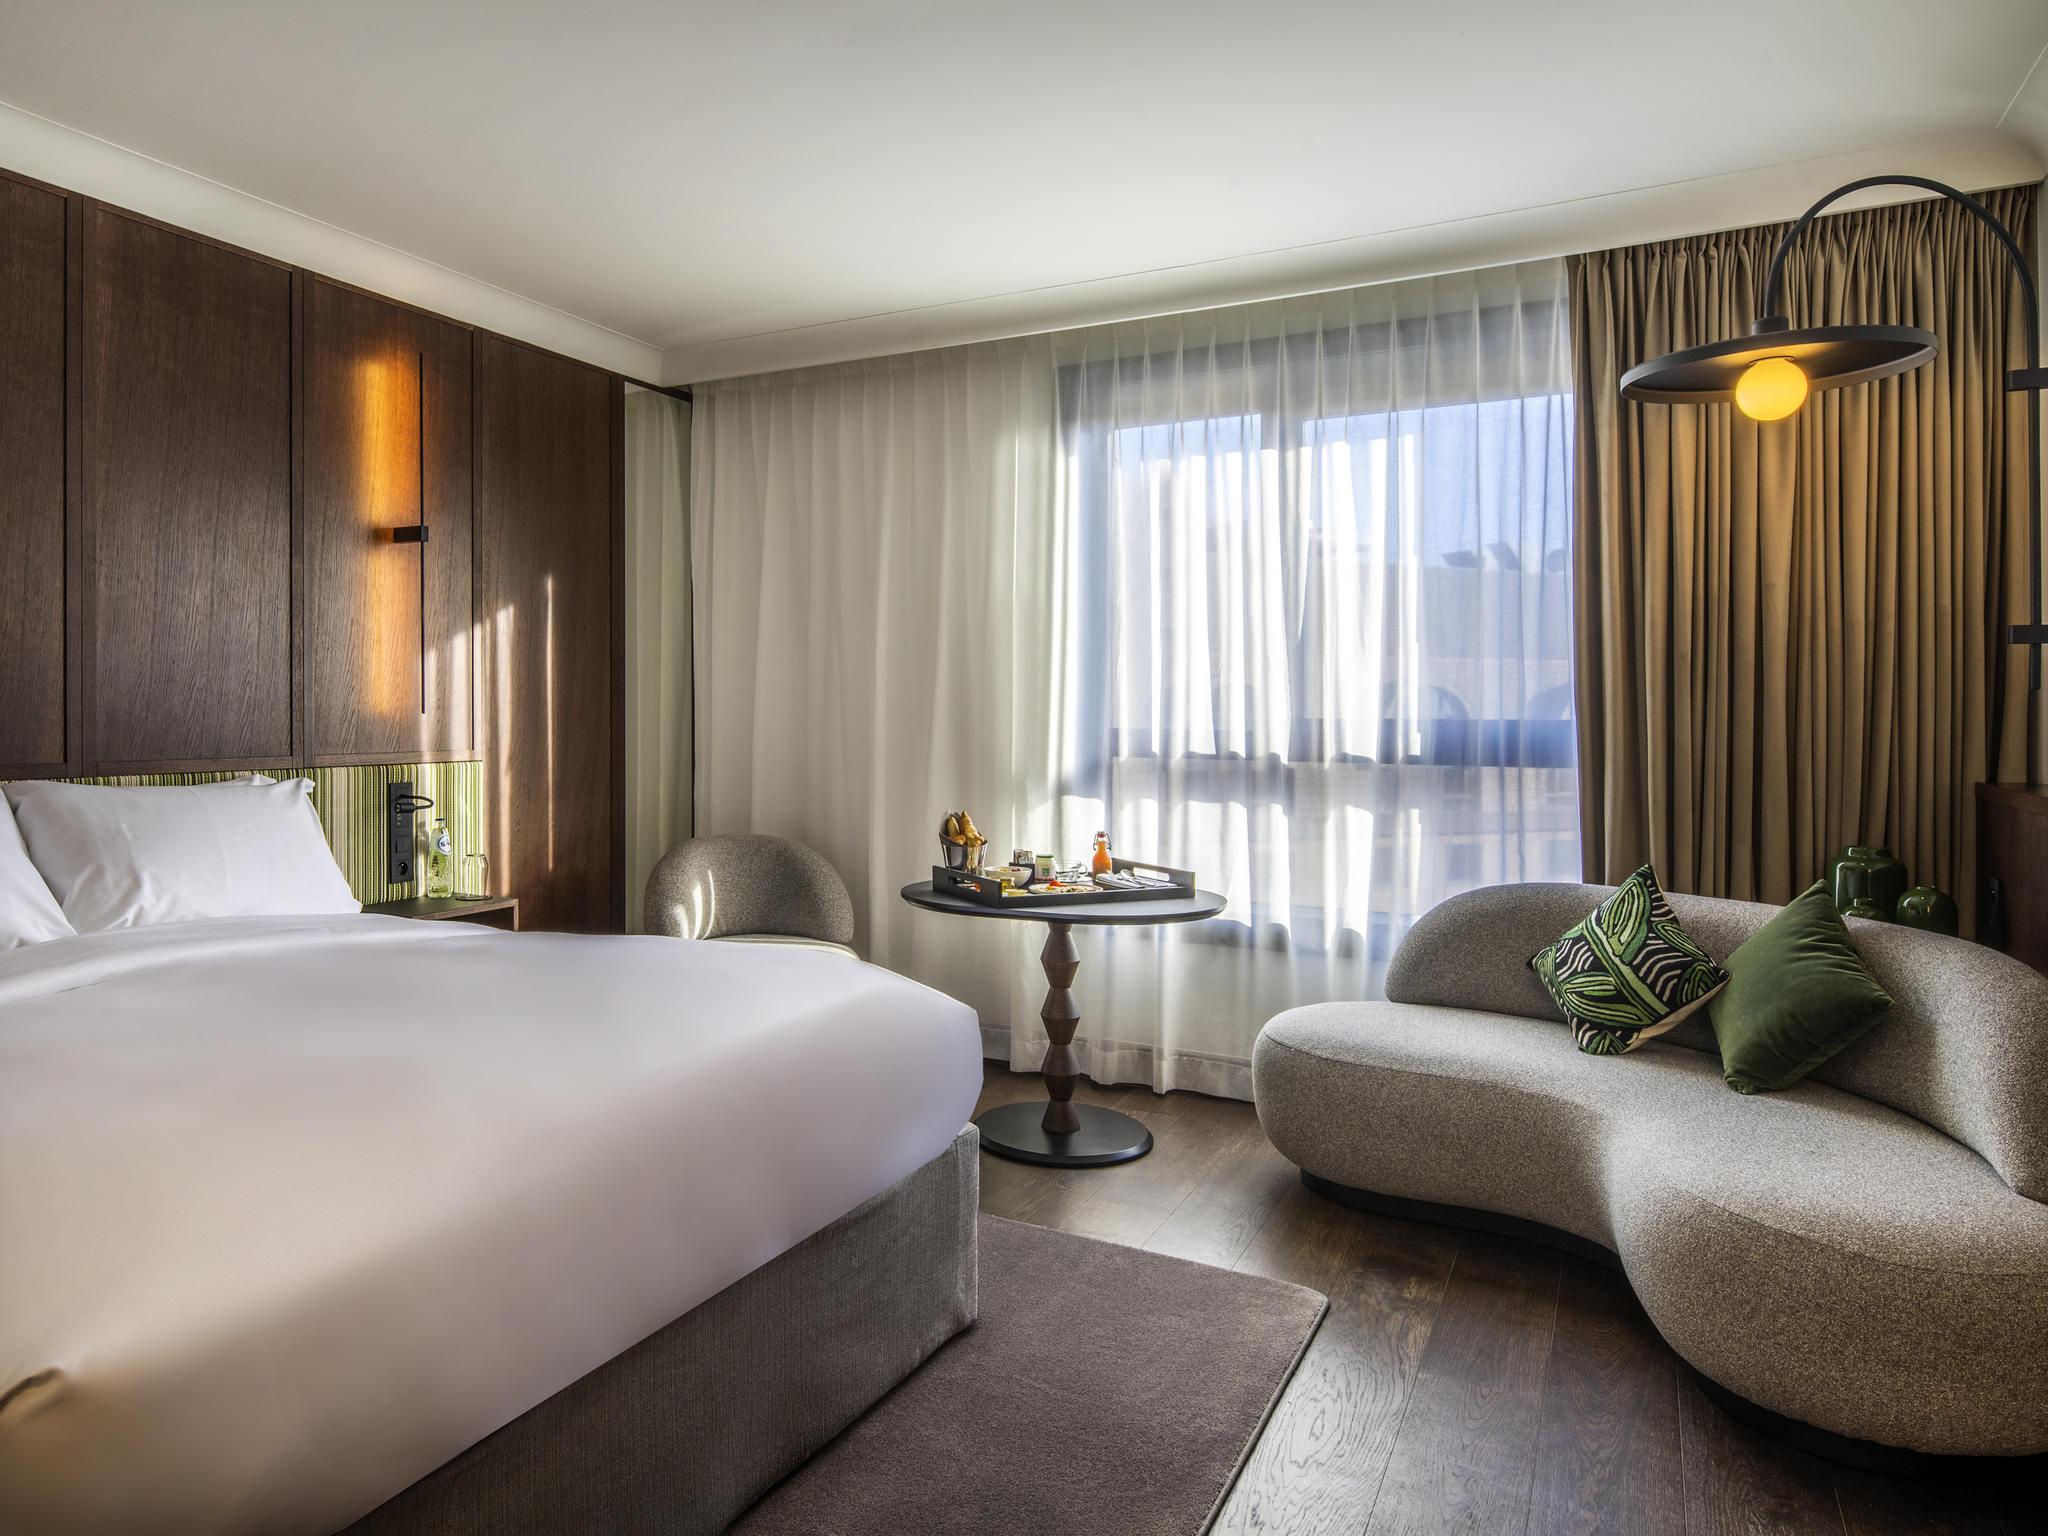 فندق - سوفيتل Sofitel براسيلز لو لويز